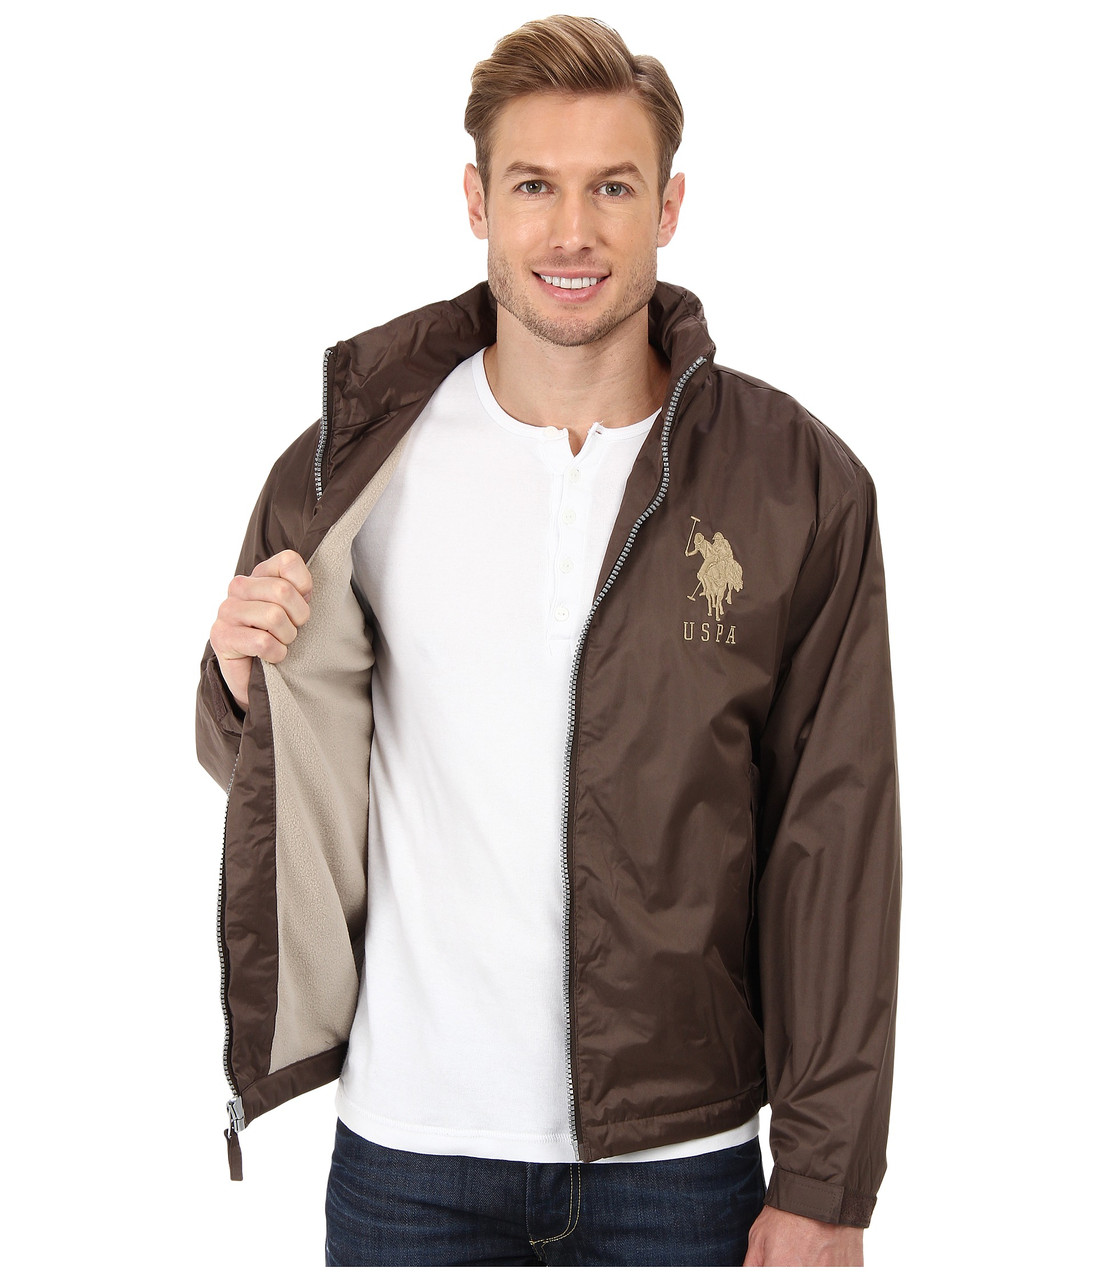 Мужские Куртки US Polo Assn  lookbuckcom